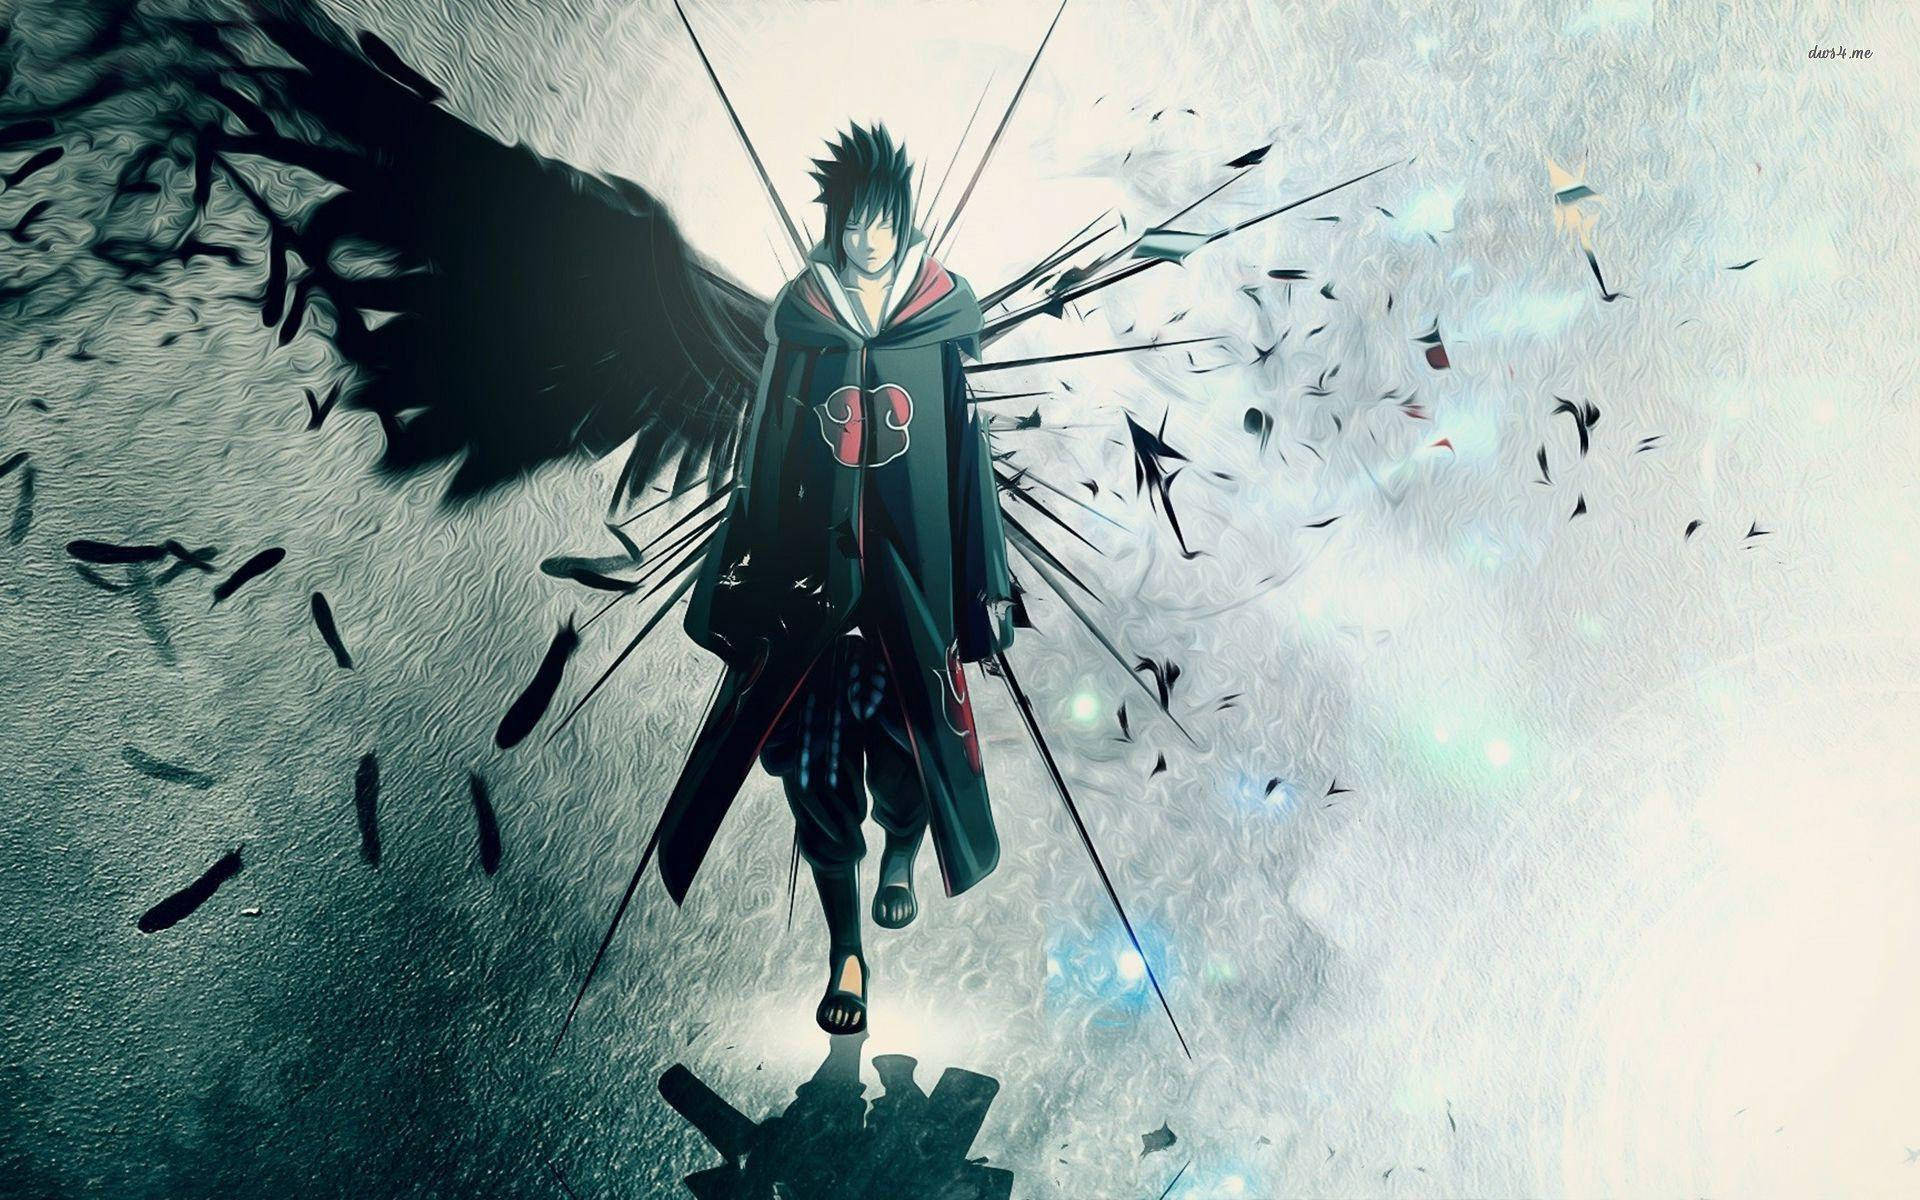 Sasuke Uchiha Wallpapers - Full HD wallpaper search